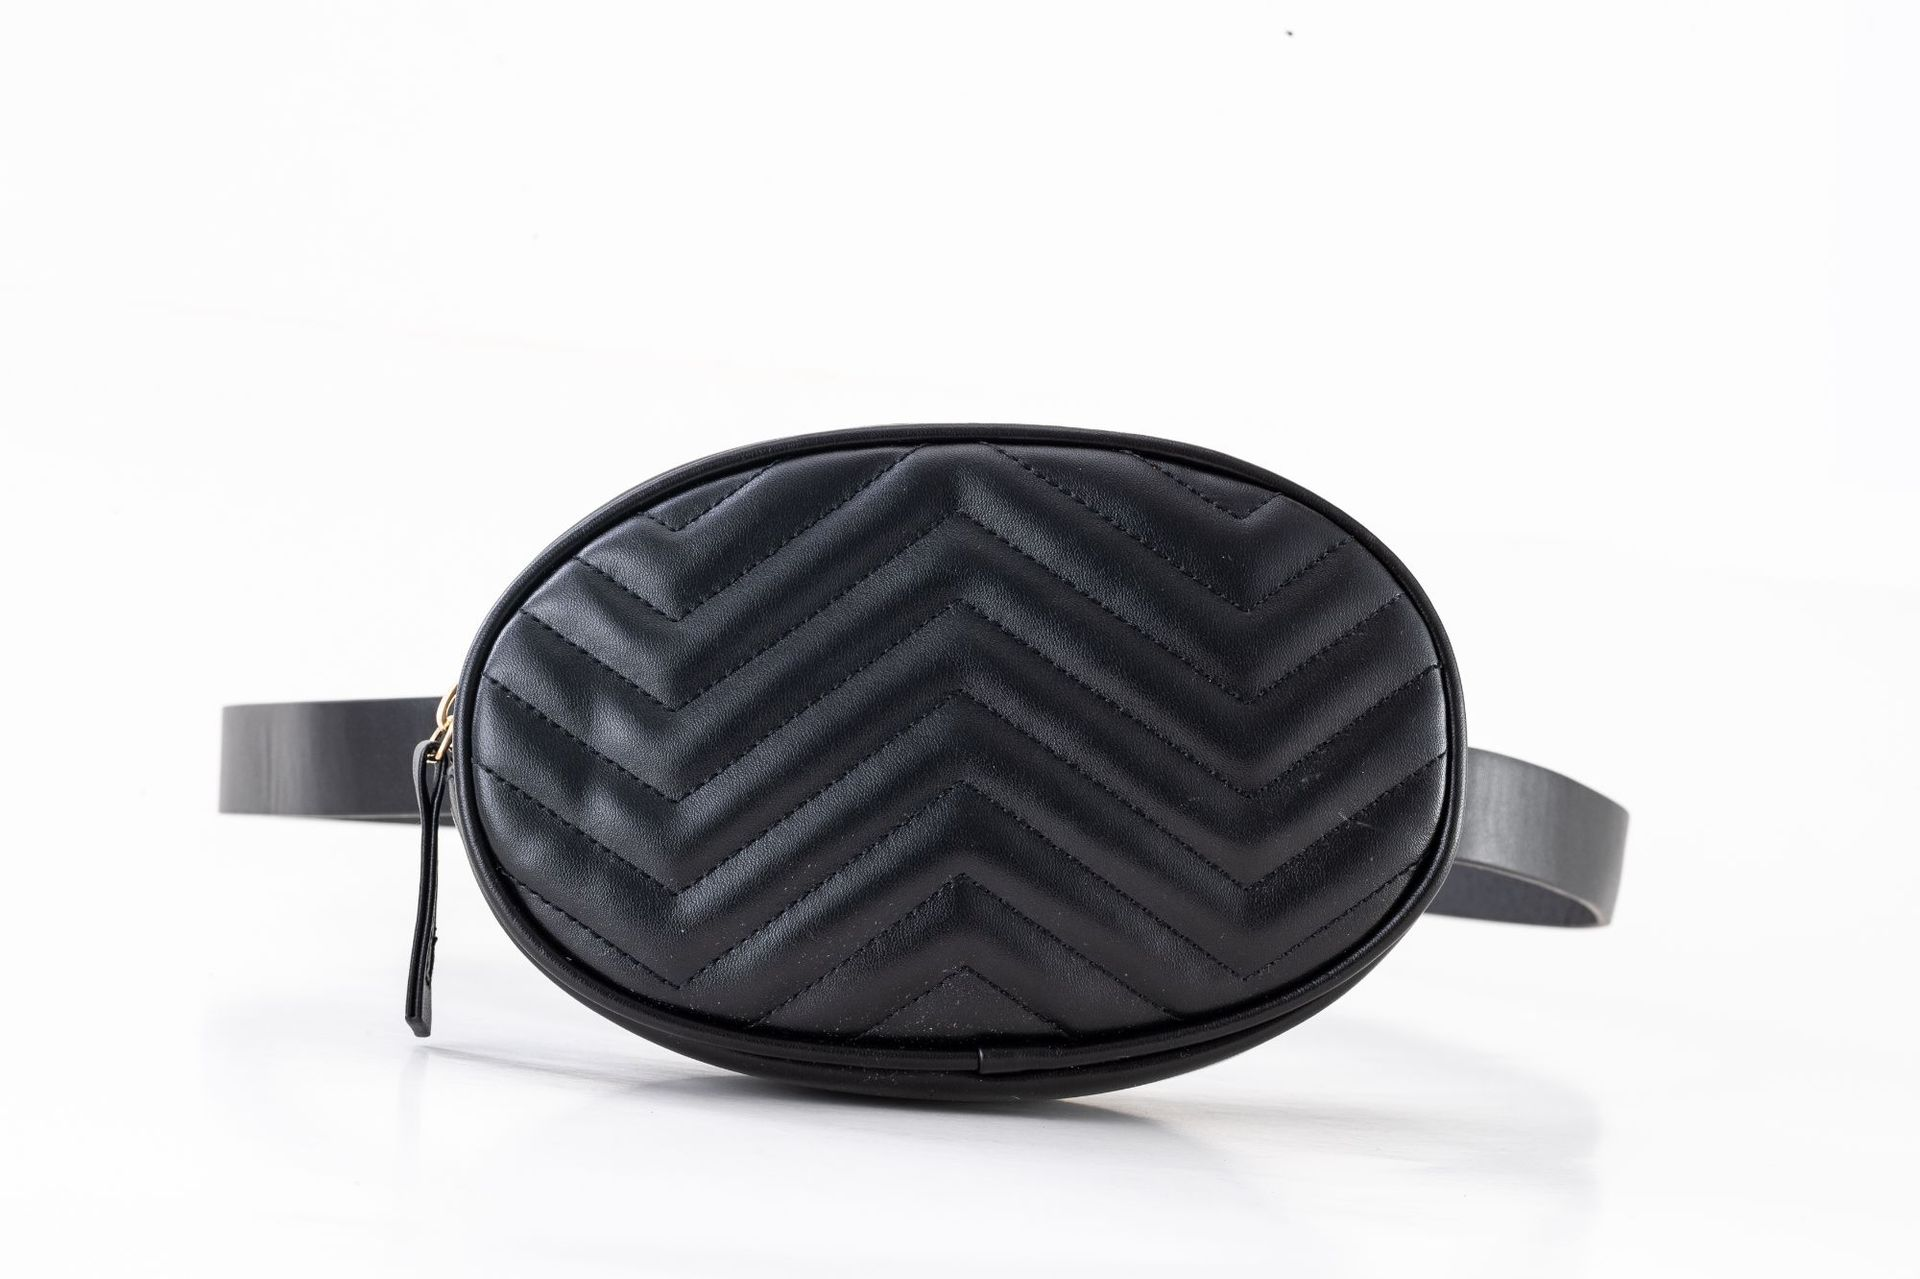 Women Waist Bags Waterproof PU Leather Belt Bag Fanny Pack Crossbody Bumbag for Party, Travel, Hikin